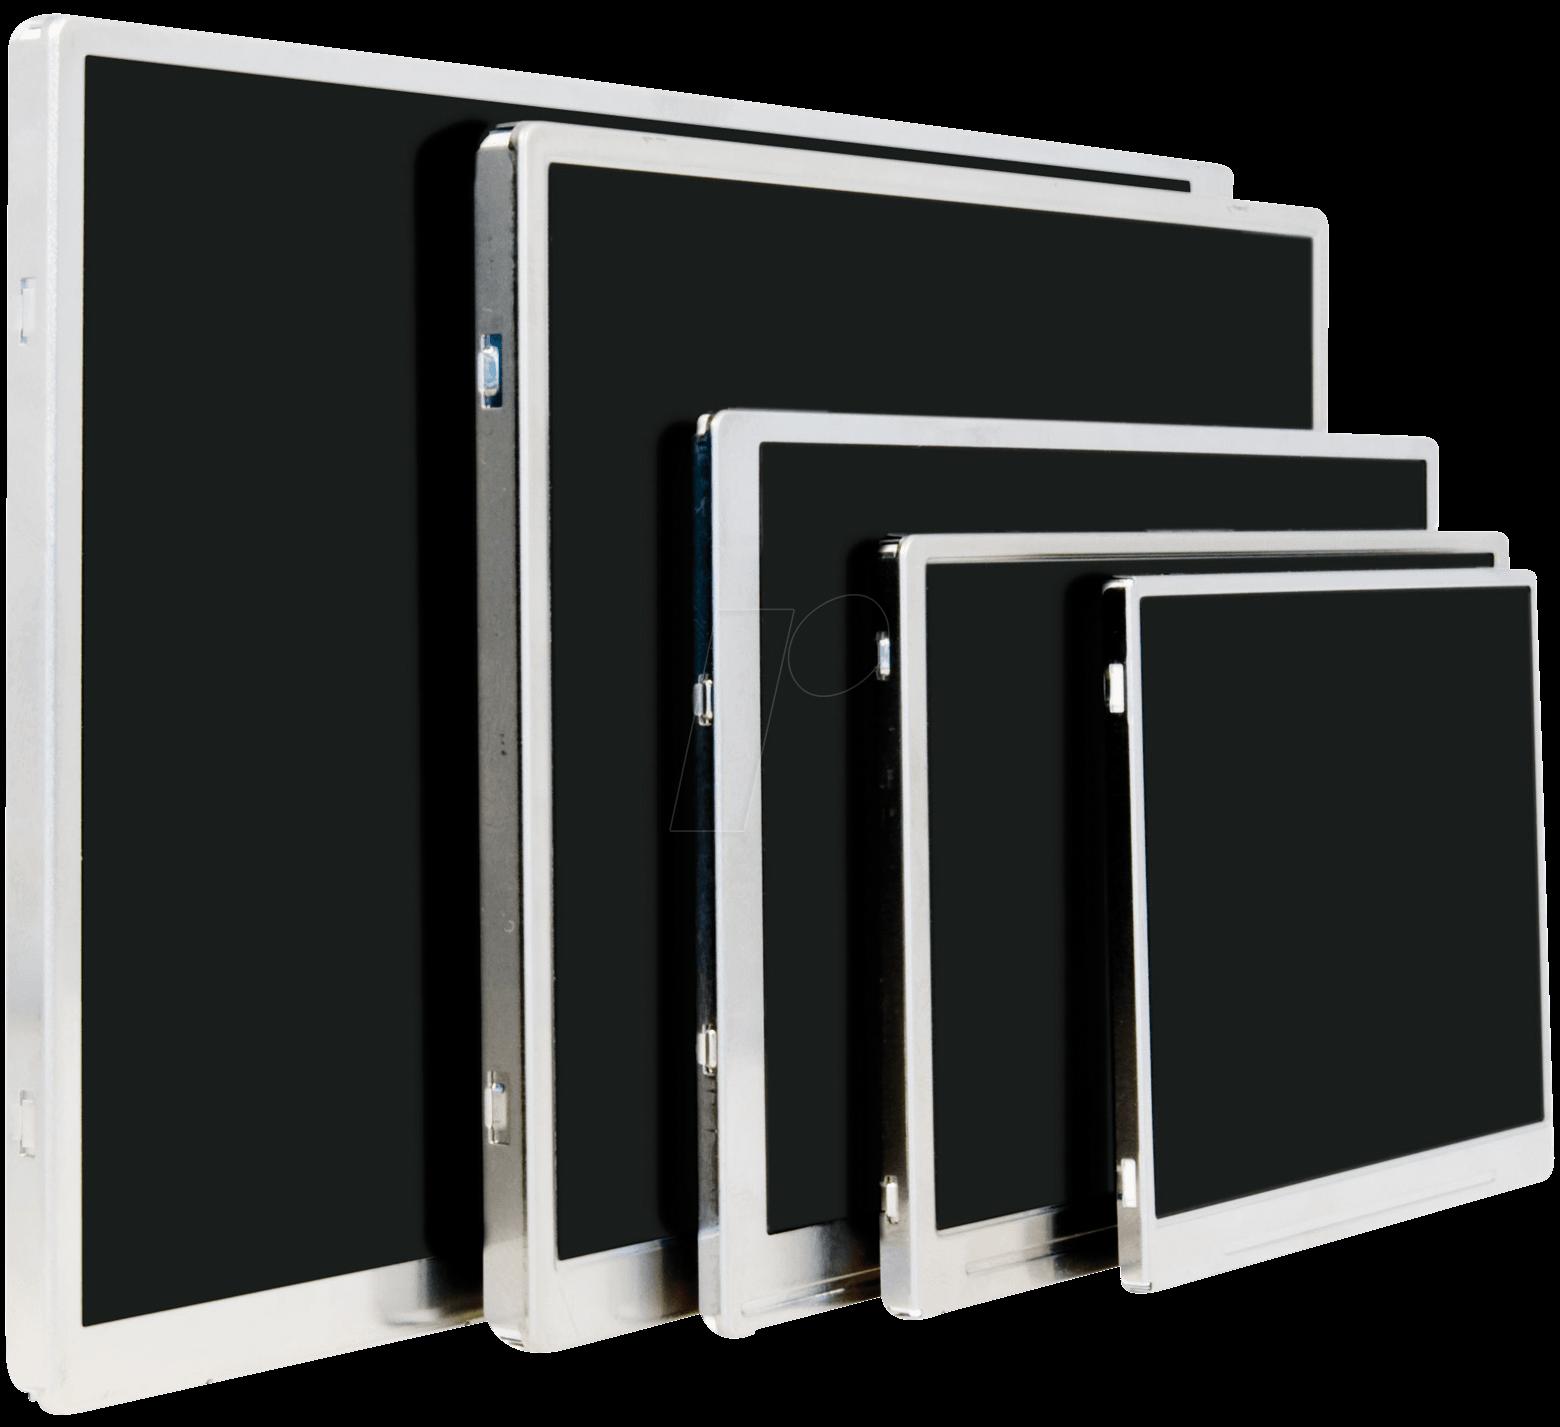 tft dis 4 3 tft display 10 9cm 4 3 ohne touch panel. Black Bedroom Furniture Sets. Home Design Ideas